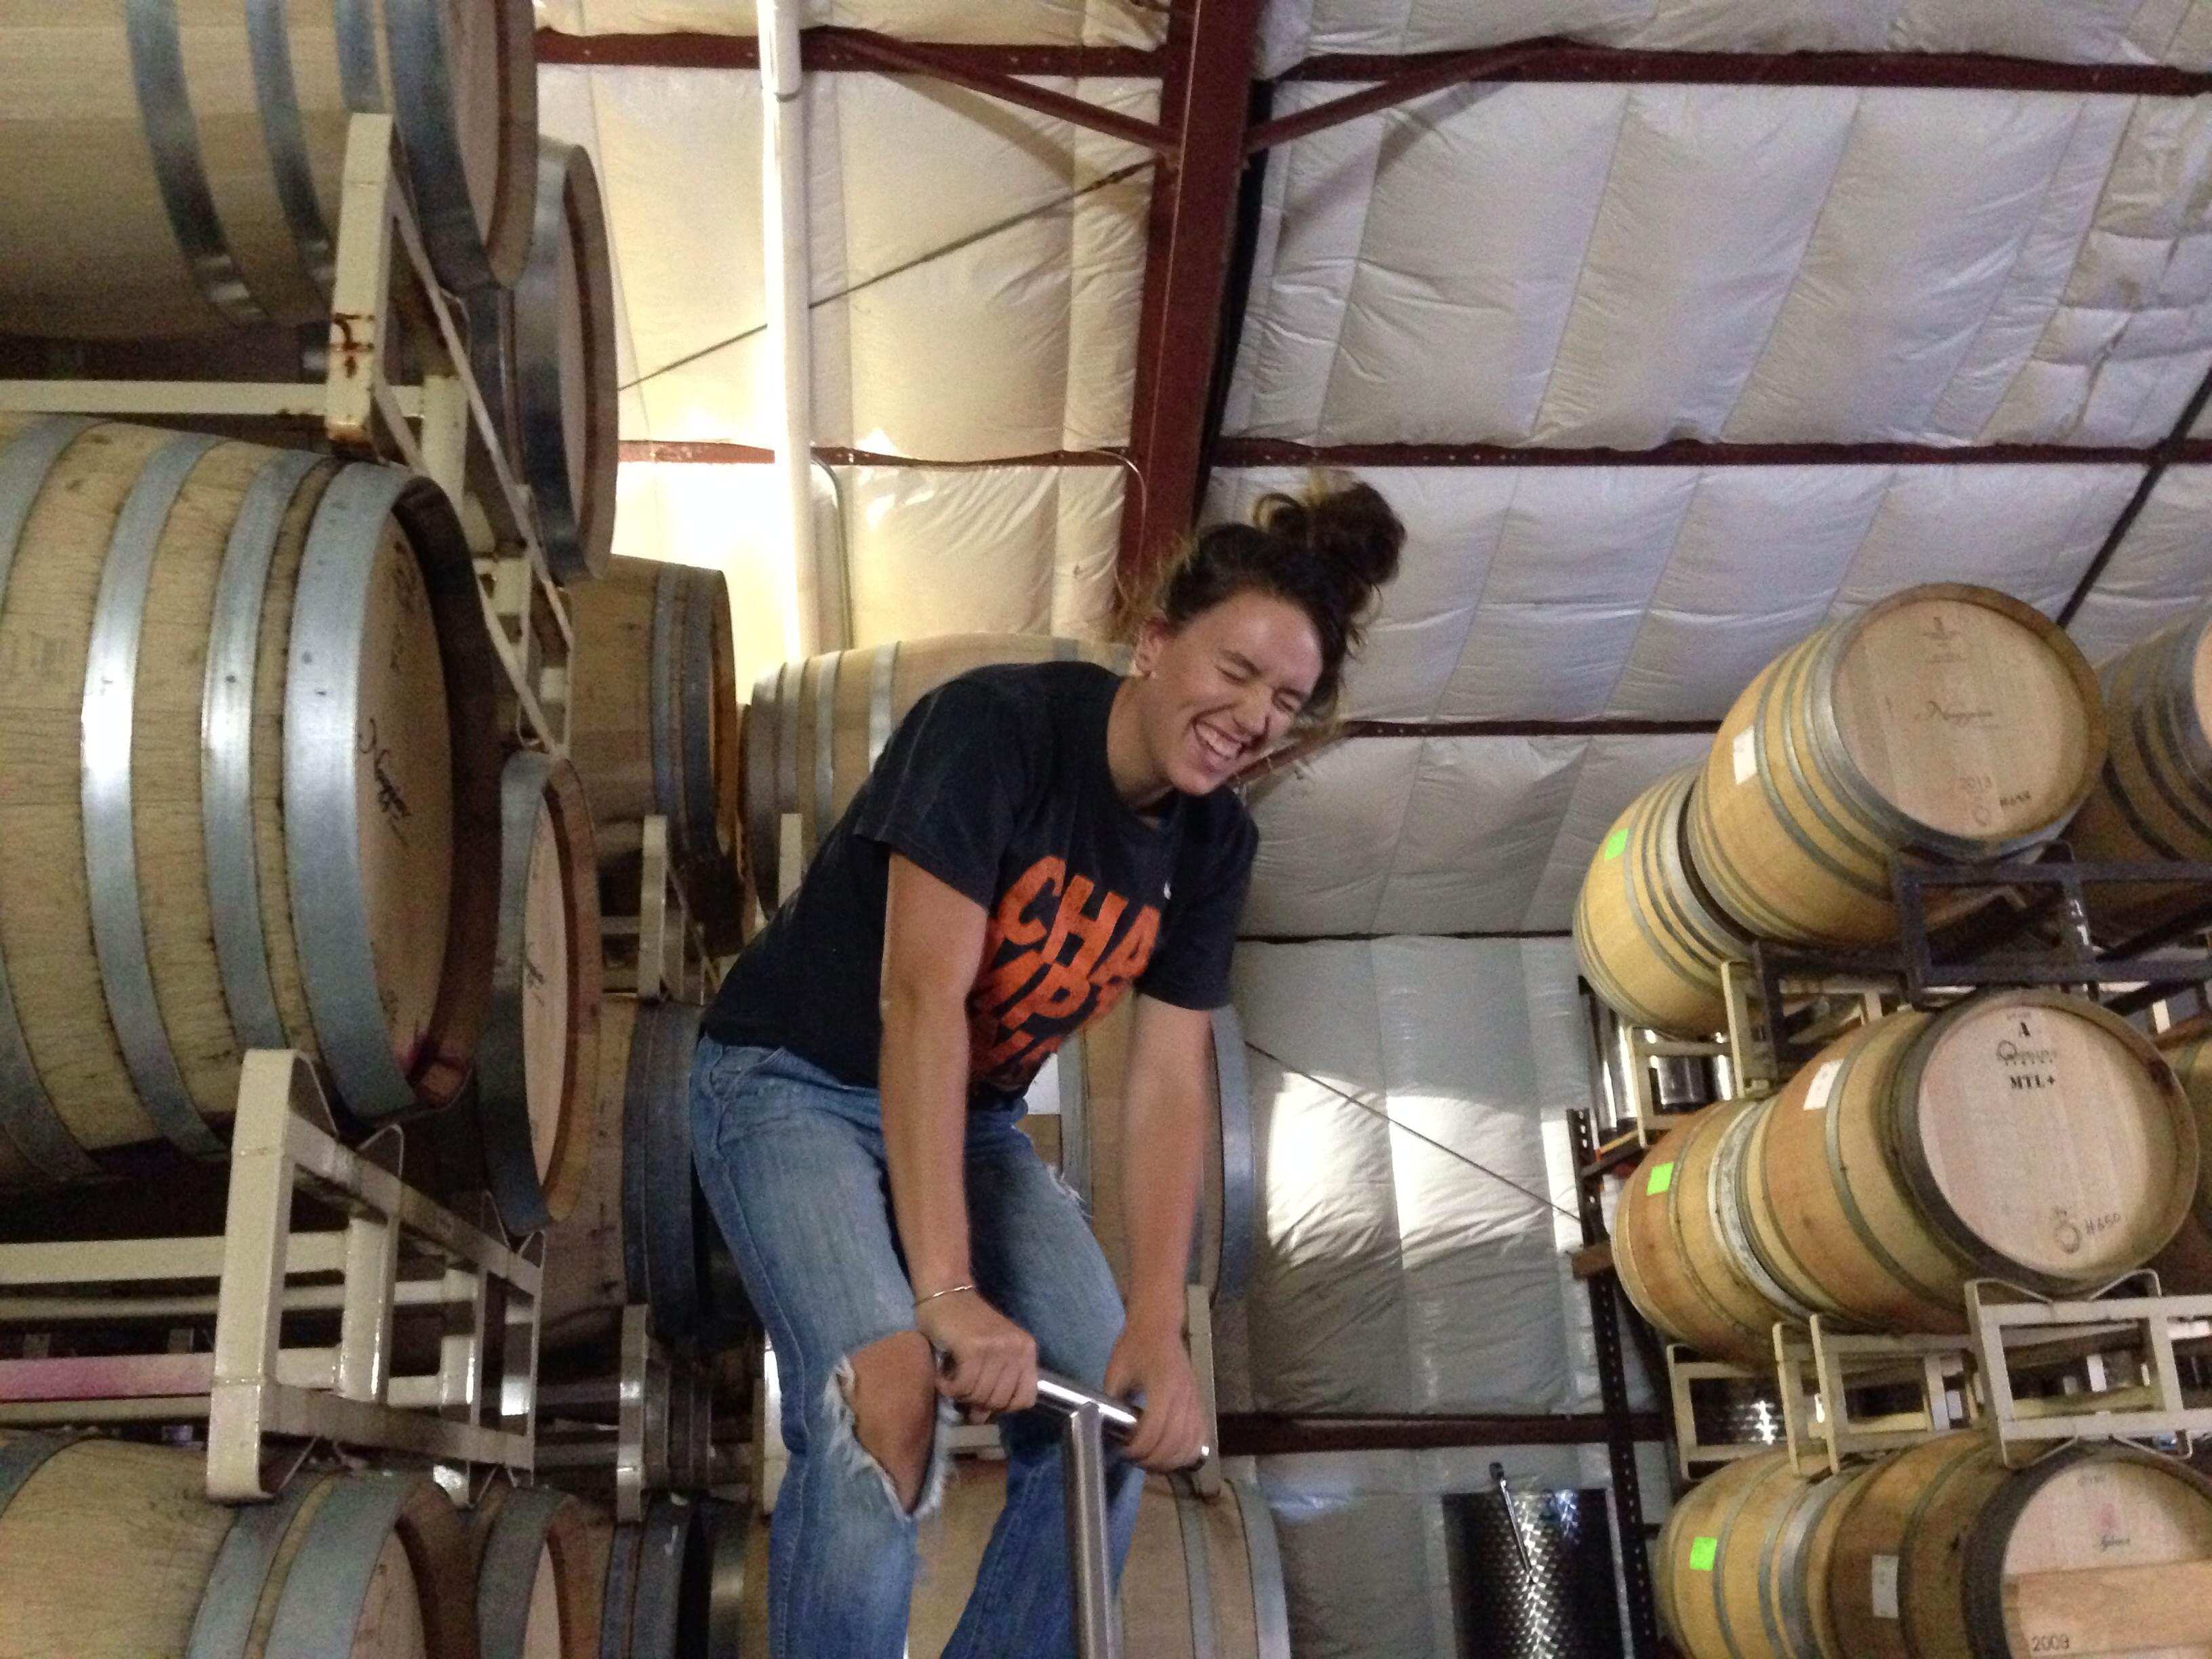 interns 14 0 naggiar vineyards naggiar vineyards